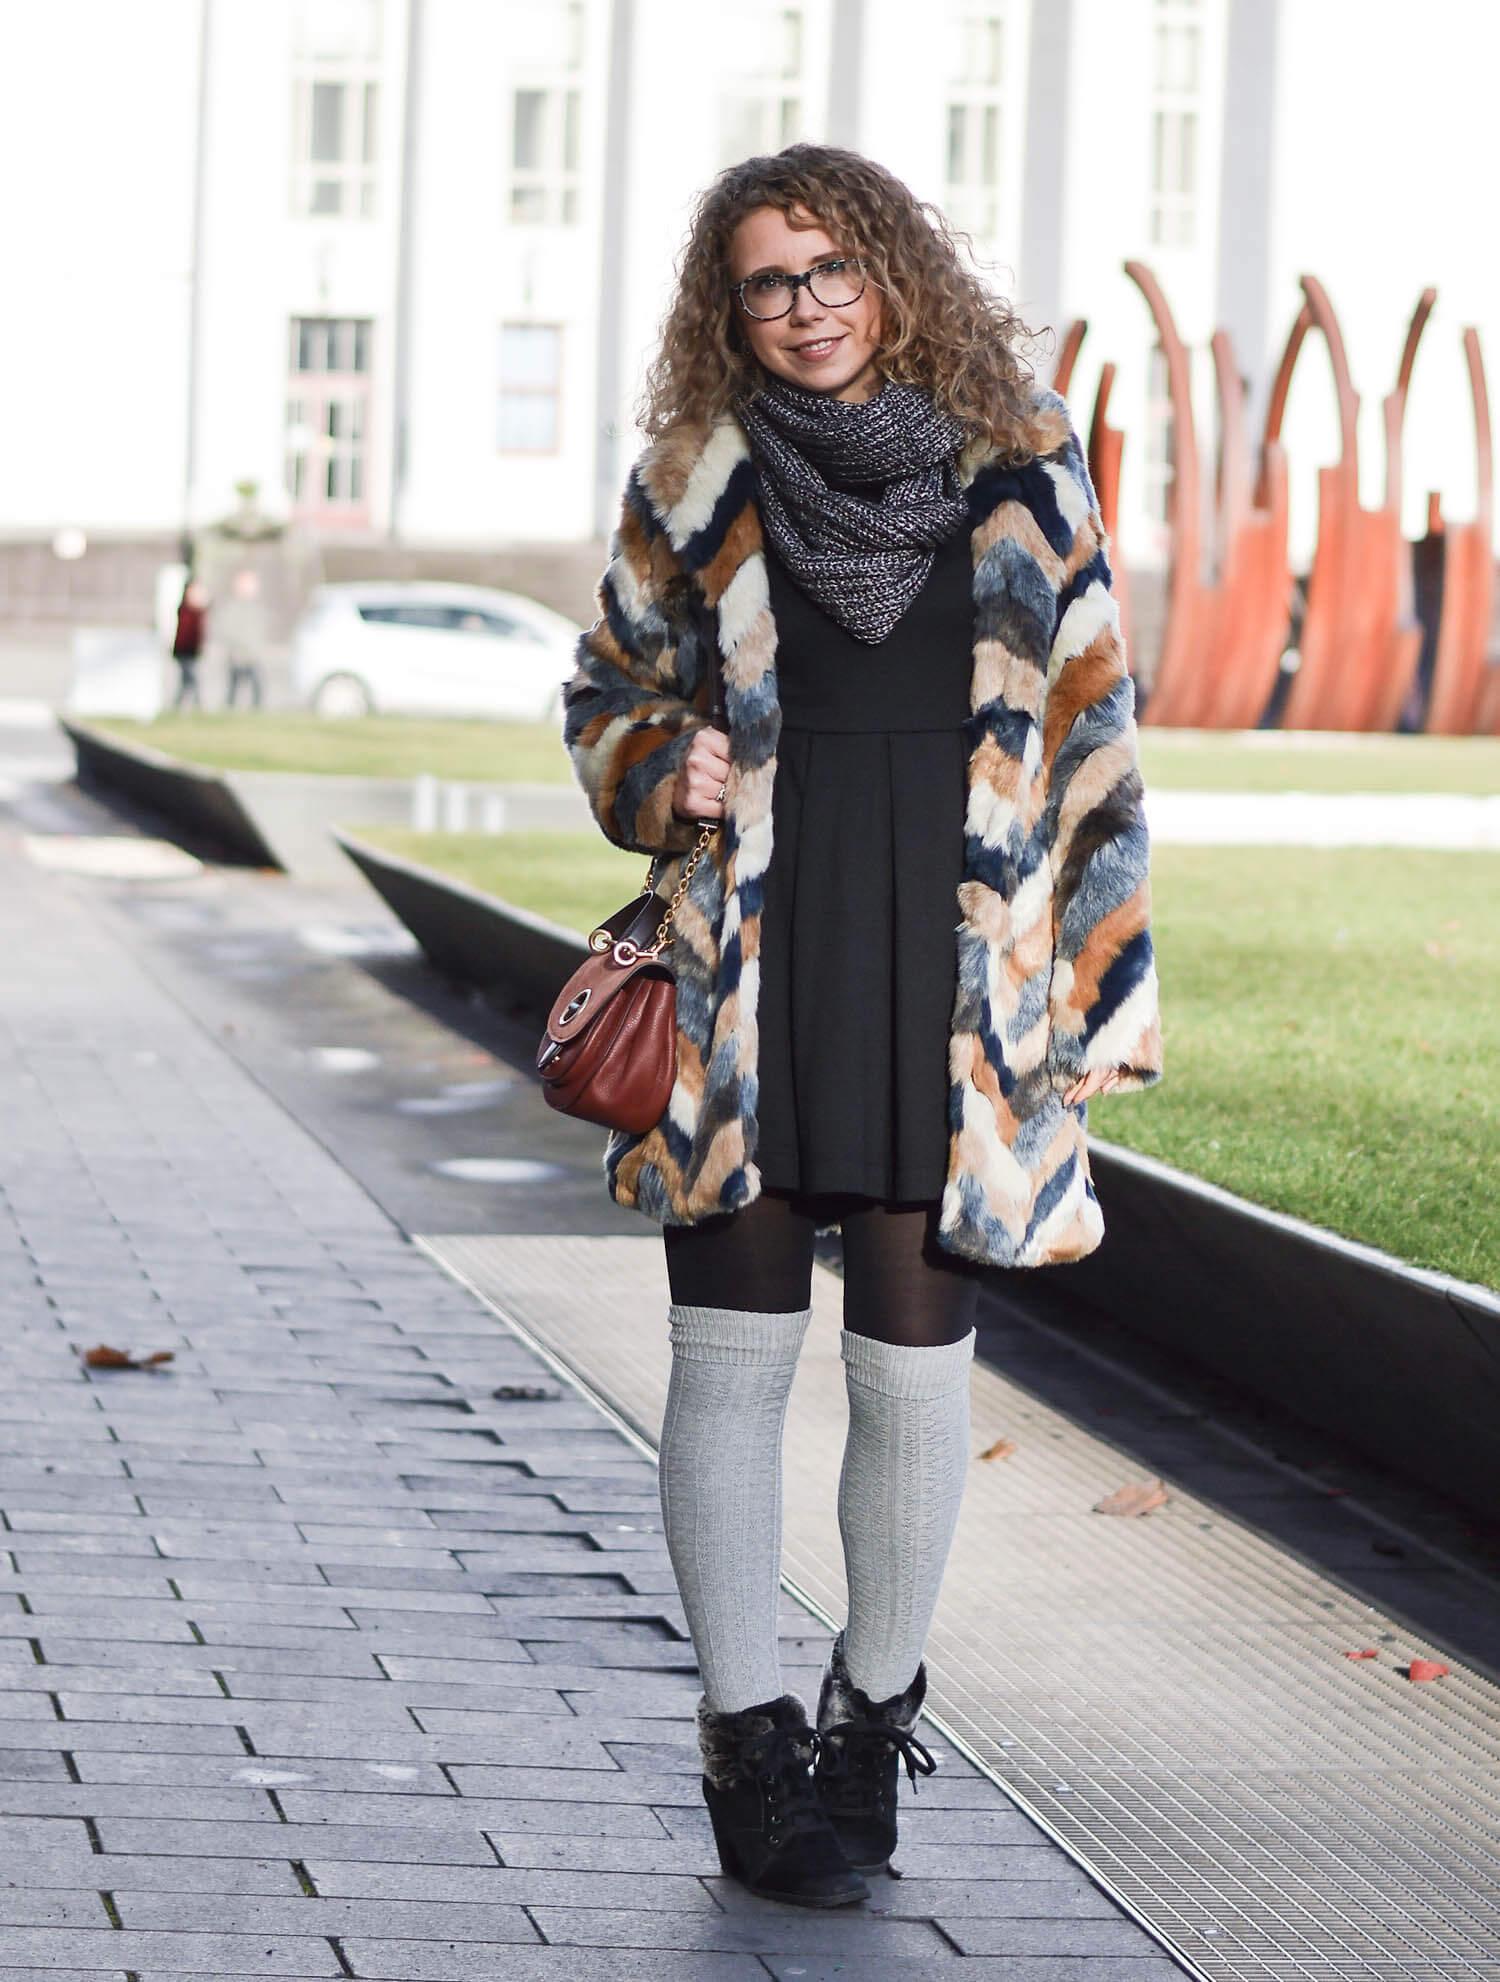 Kationette-fashionblog-Outfit-Cozy-Winter-streetstyle-Fake-Fur-Overknee-Socks-michaelkors-saddlebag-curls